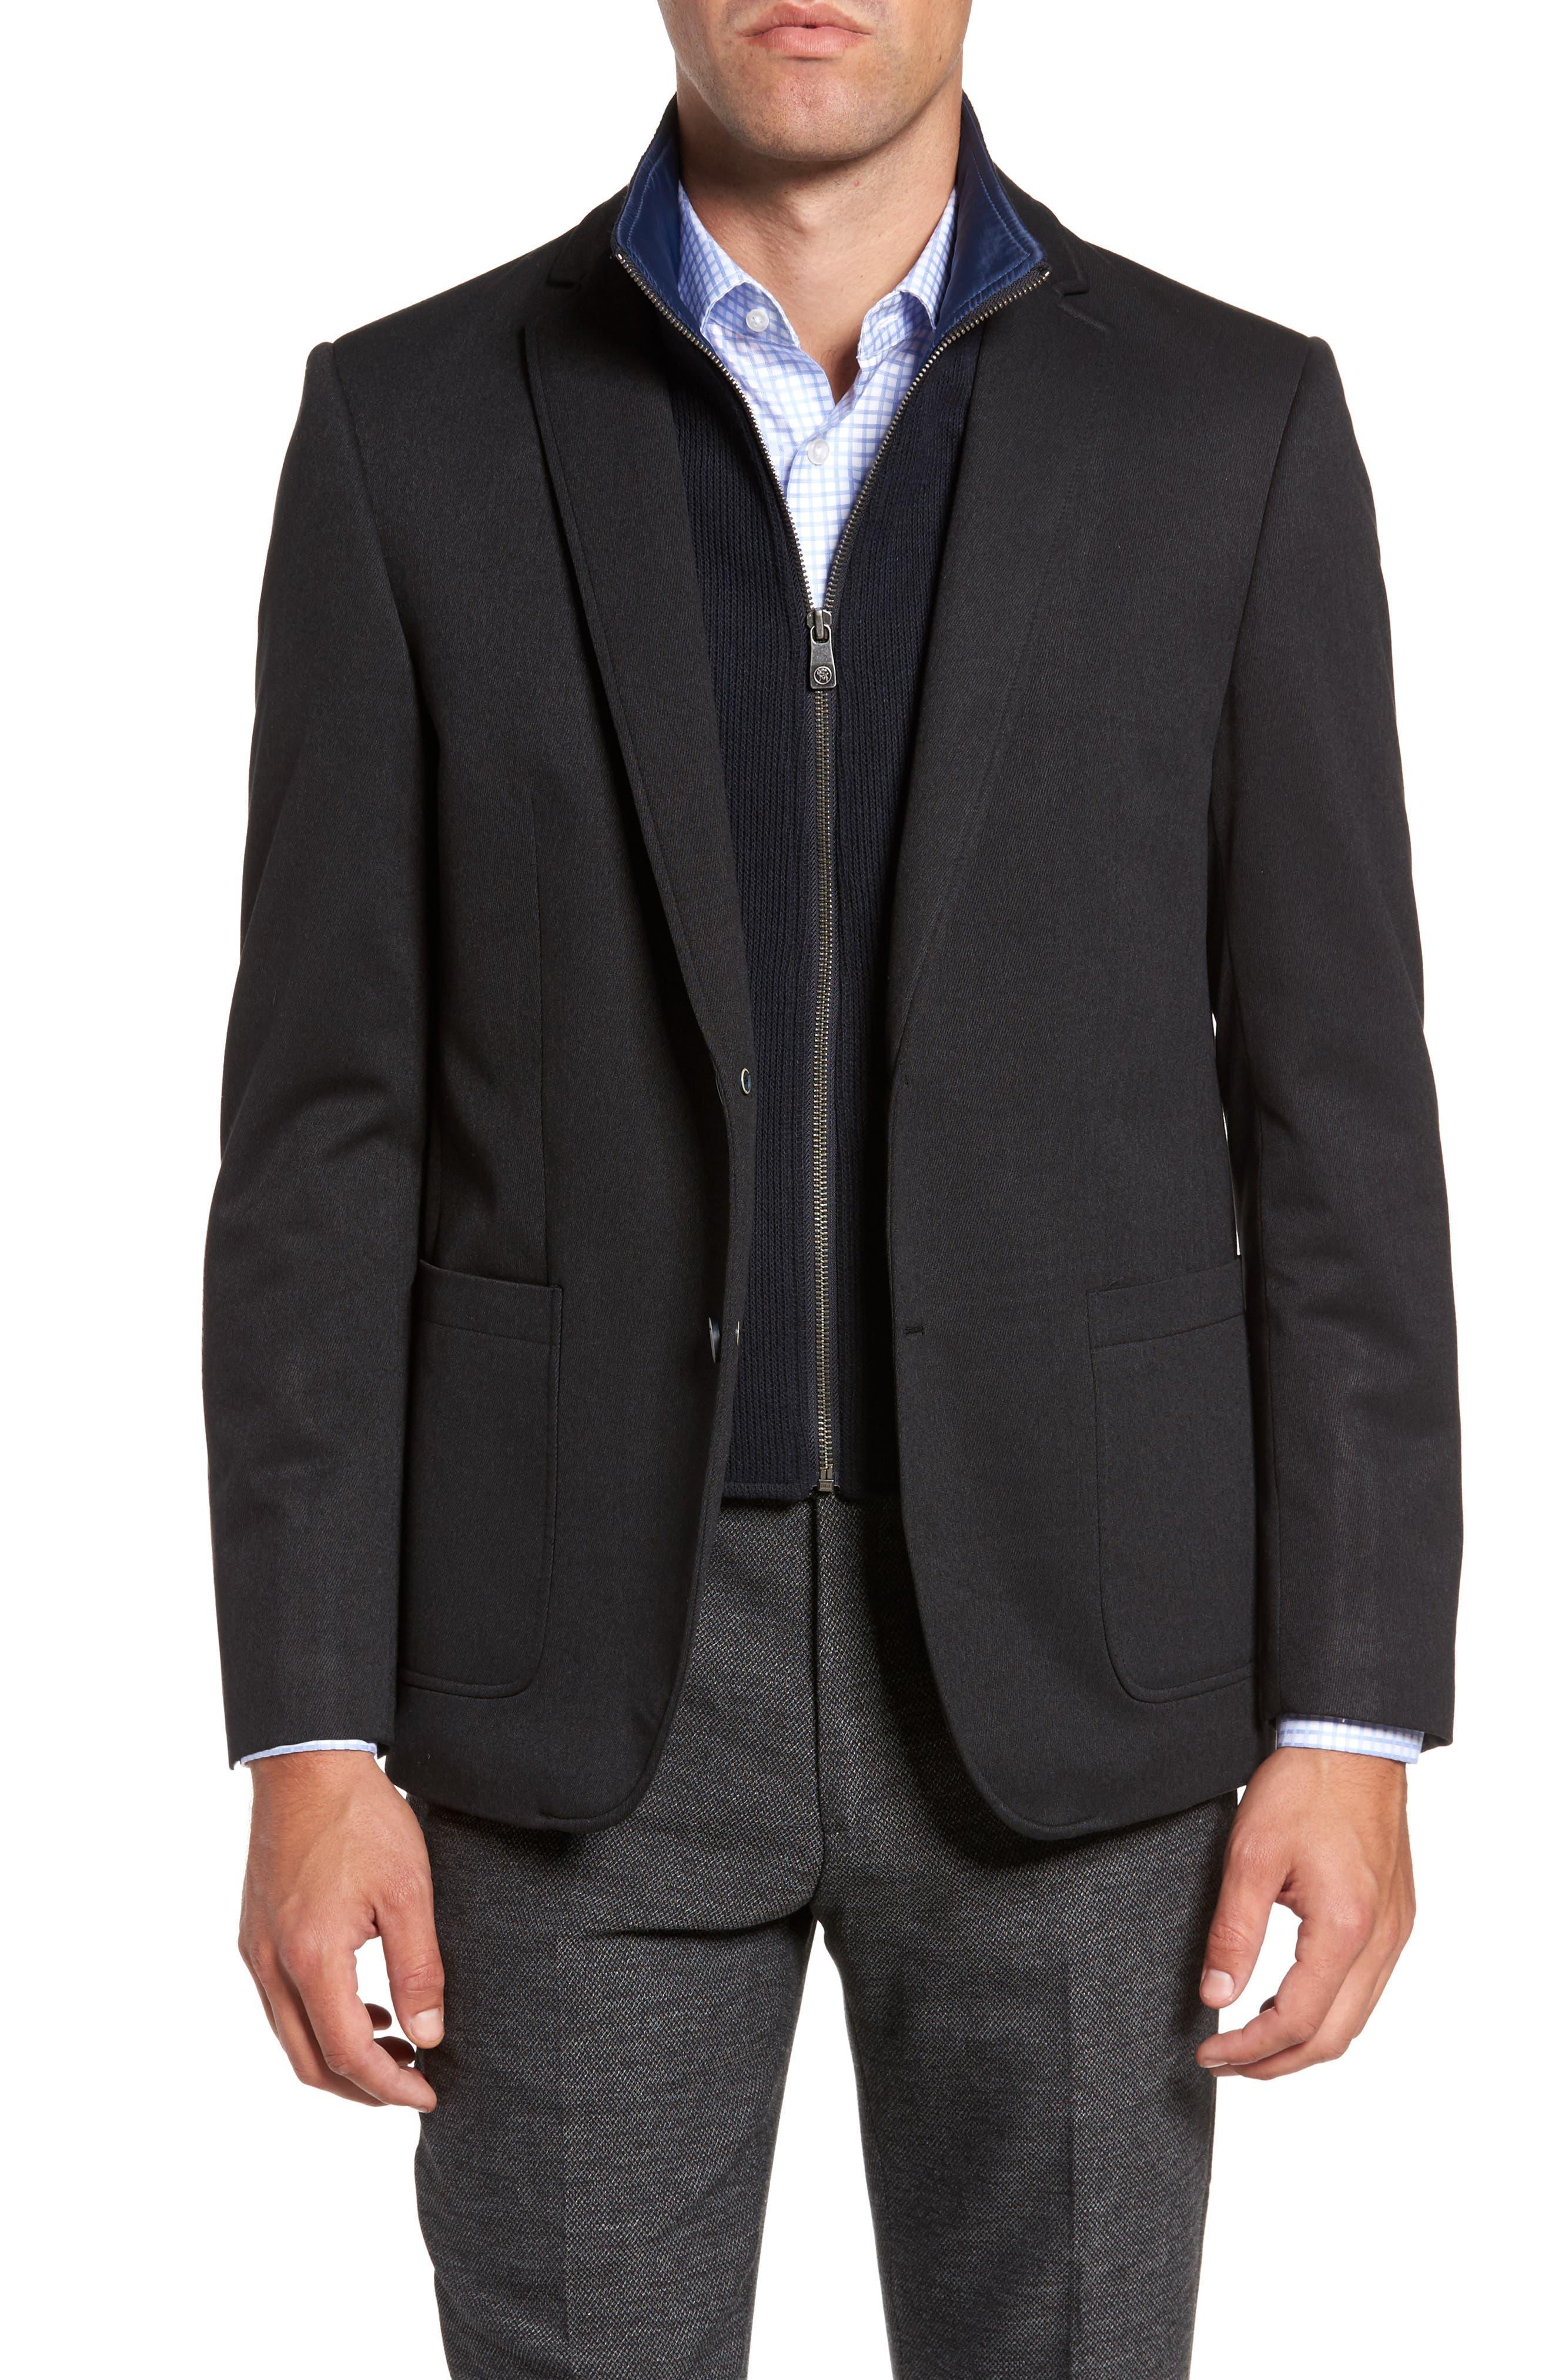 Main Image - Hart Schaffner Marx Broderick Technical Outerwear Jacket with Detachable Knit Bib